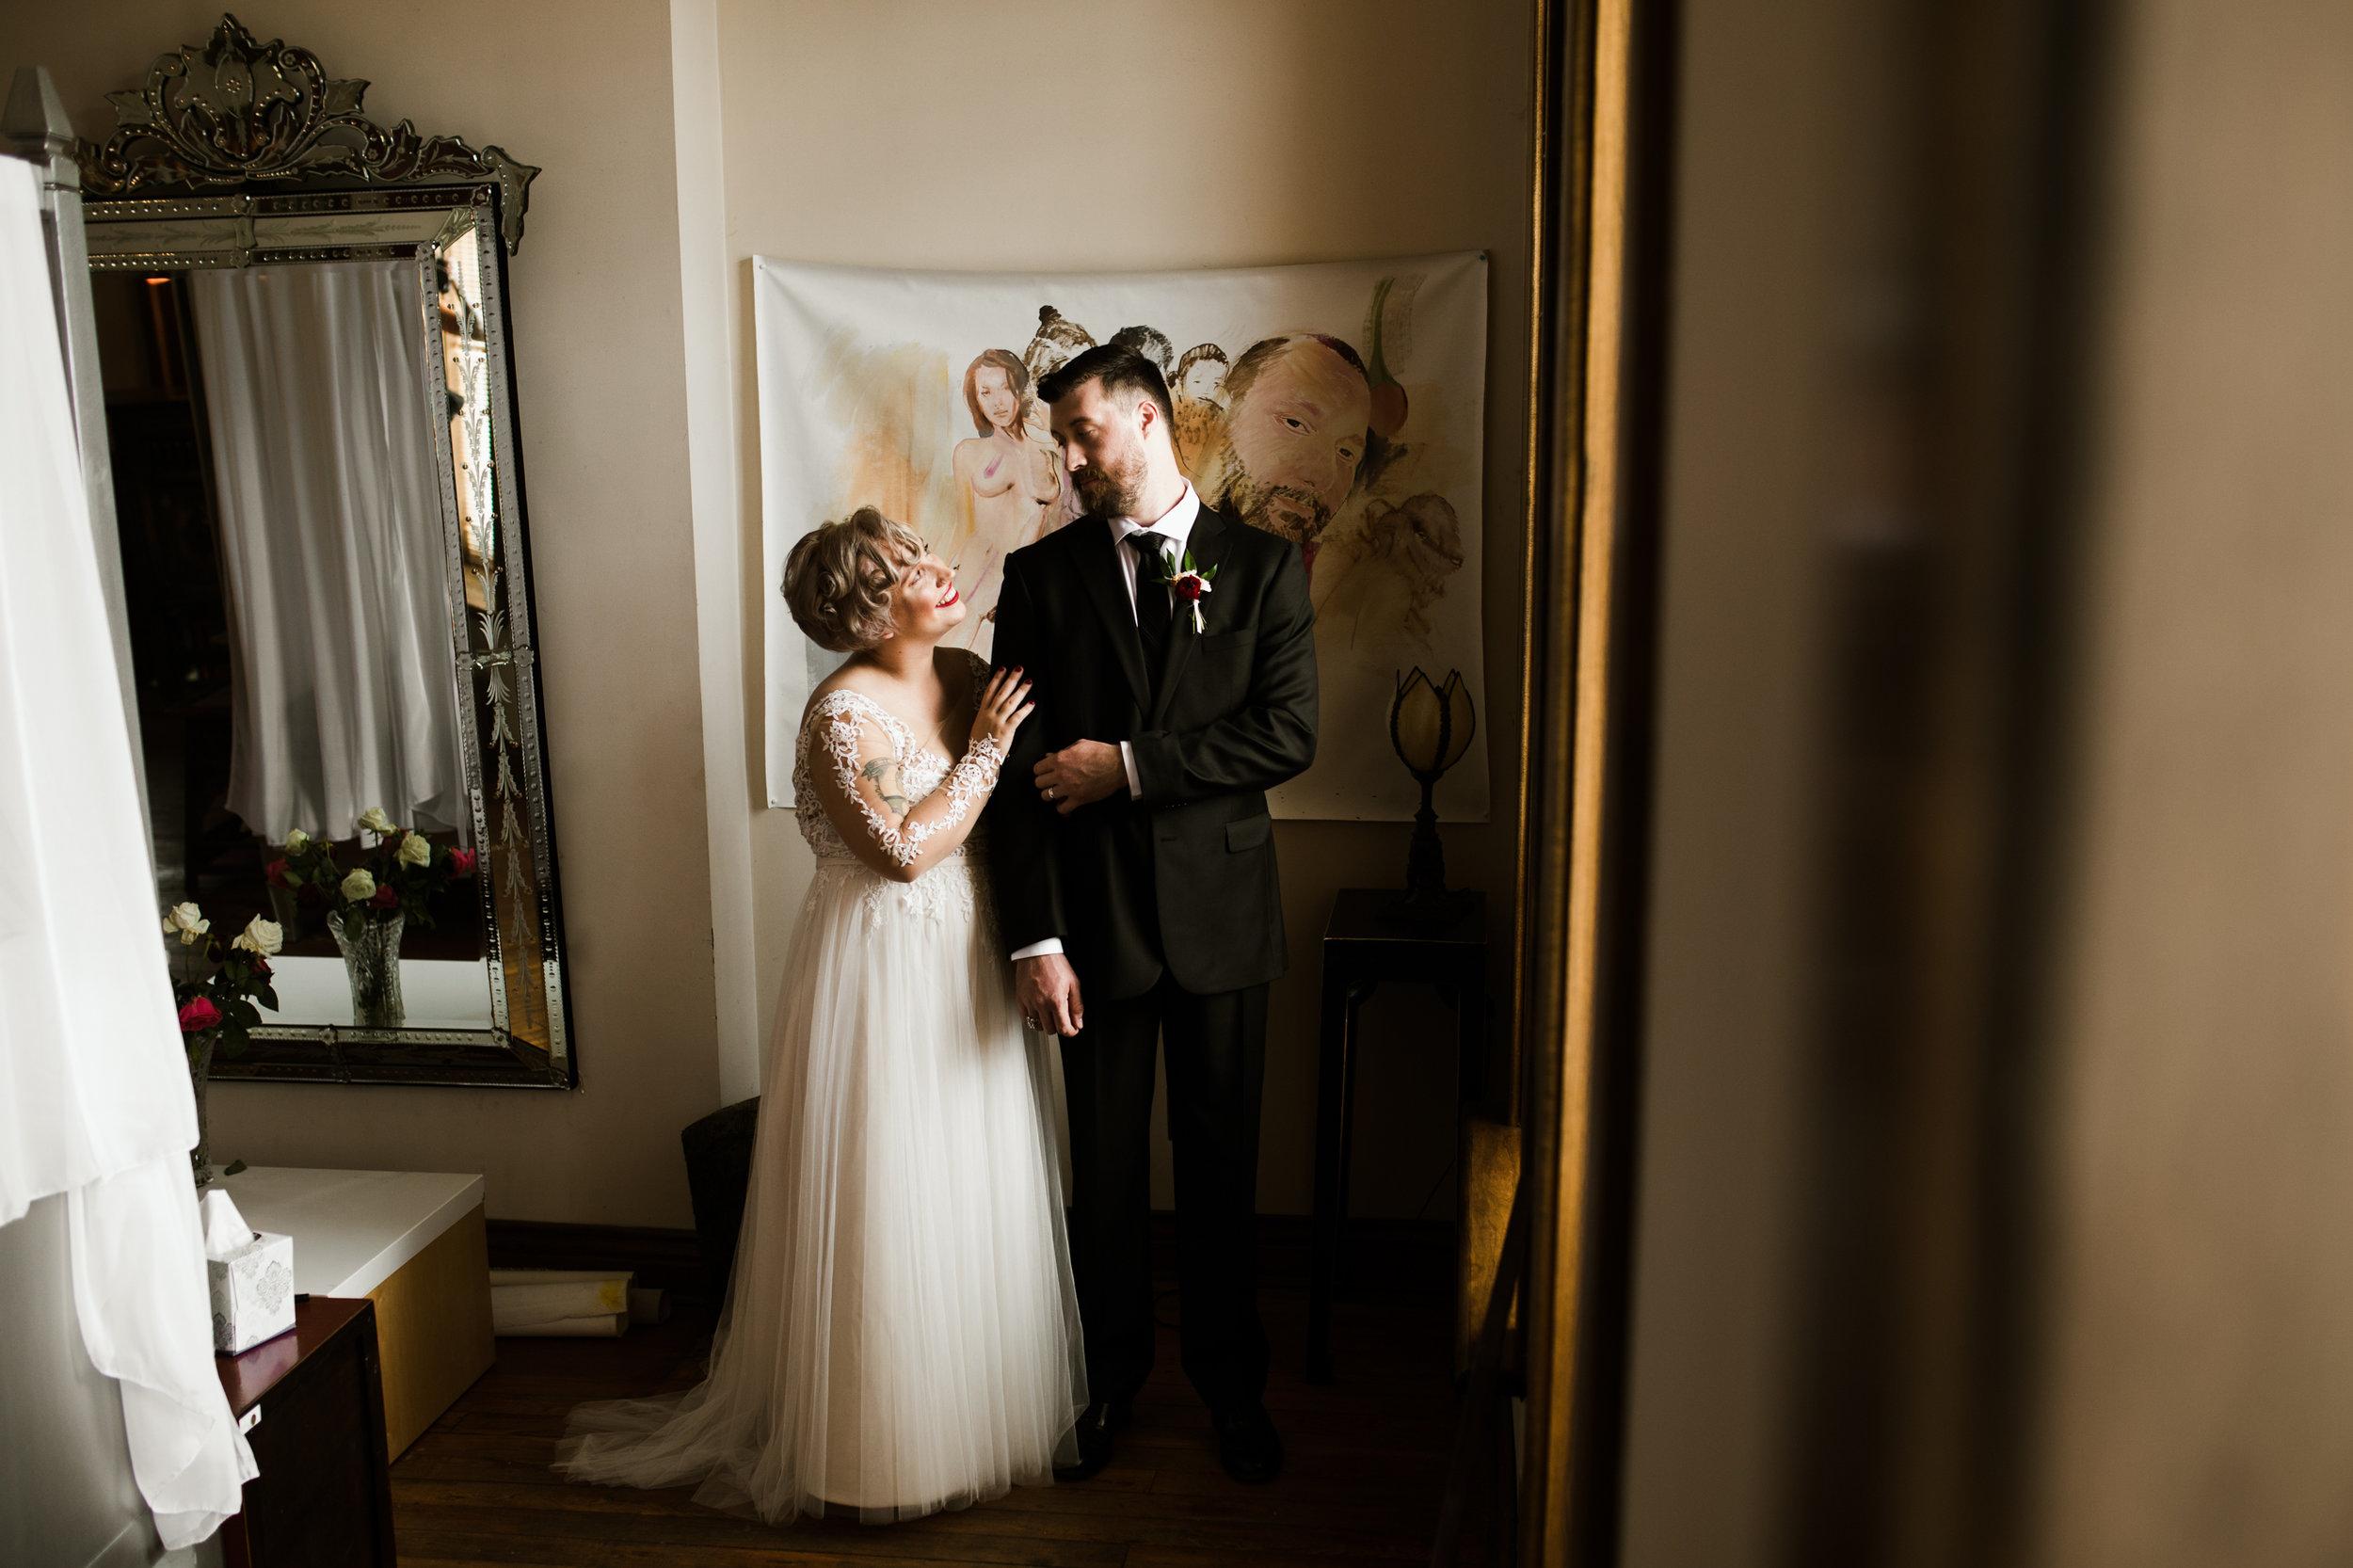 Kentucky Wedding Louisville Wedding Photographer 2018 Crystal Ludwick Photo Louisville Wedding Photographer Kentucky Wedding Photographer (87 of 105).jpg